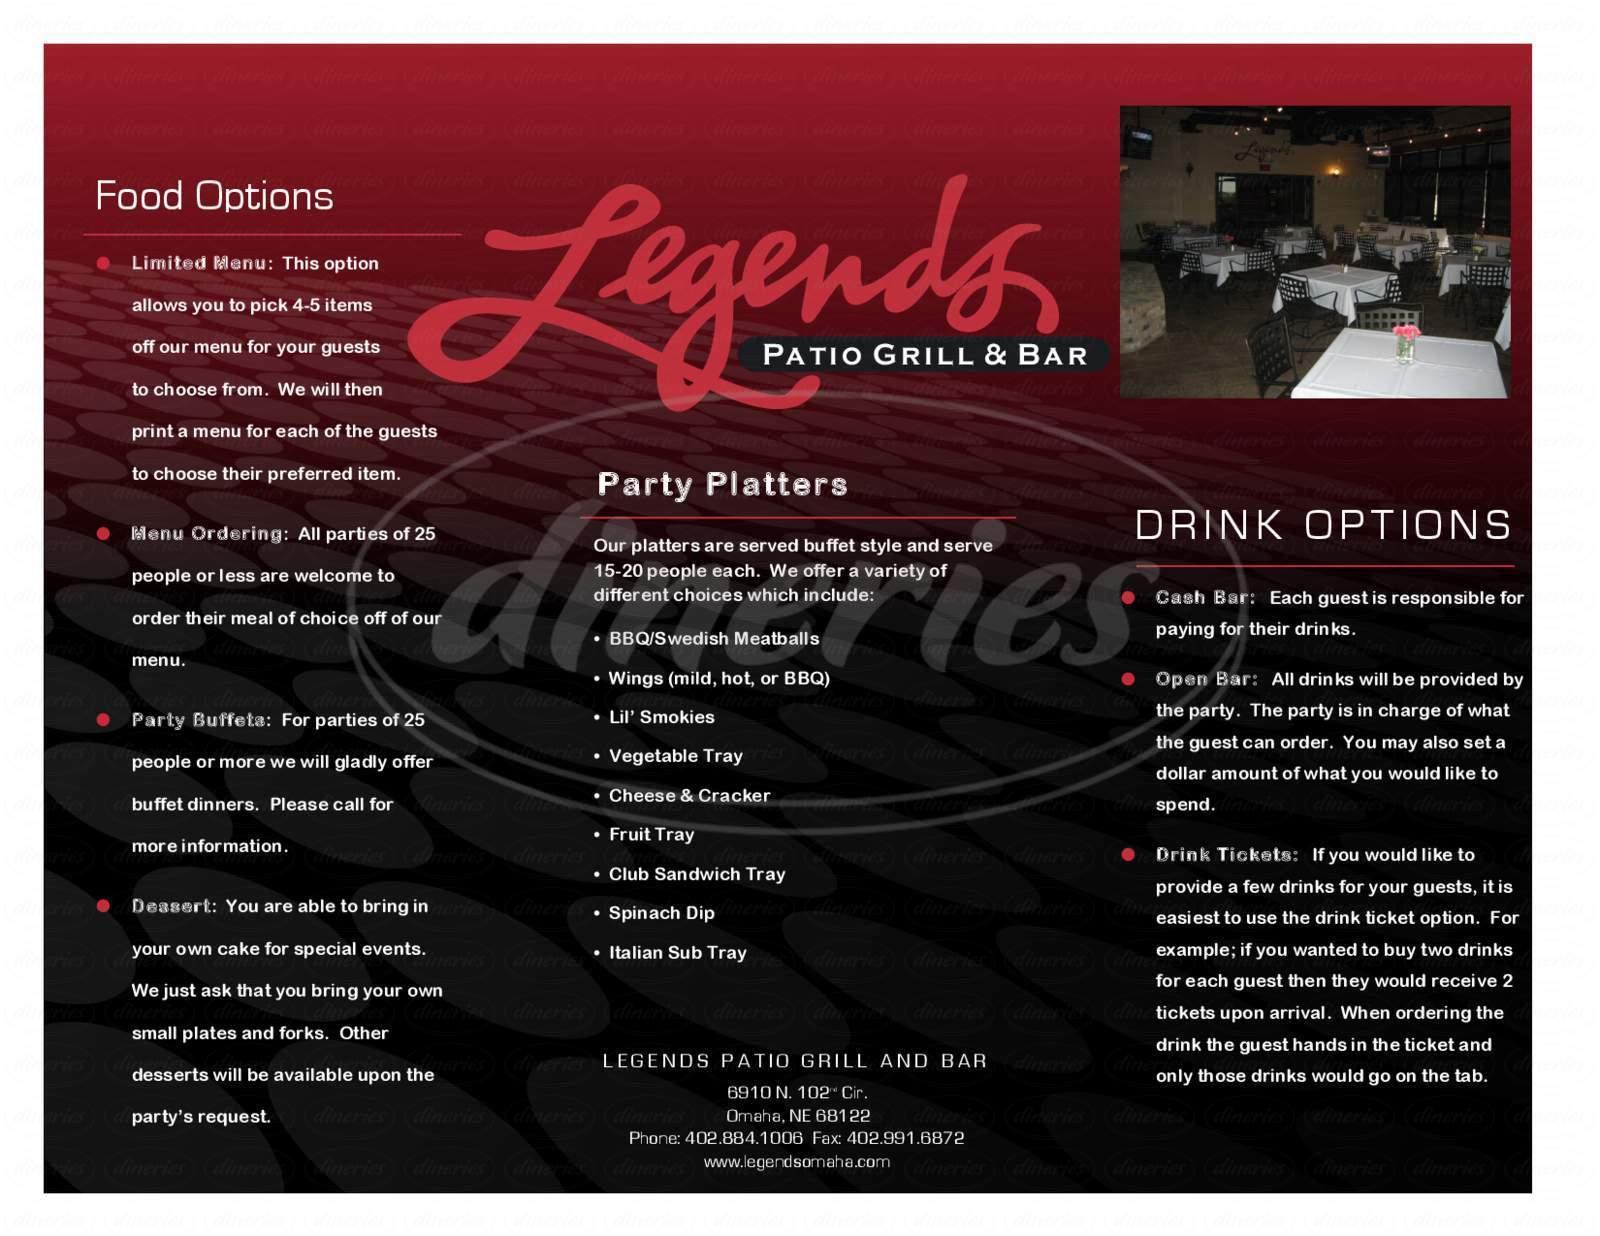 menu for Legends Patio Grill & Bar